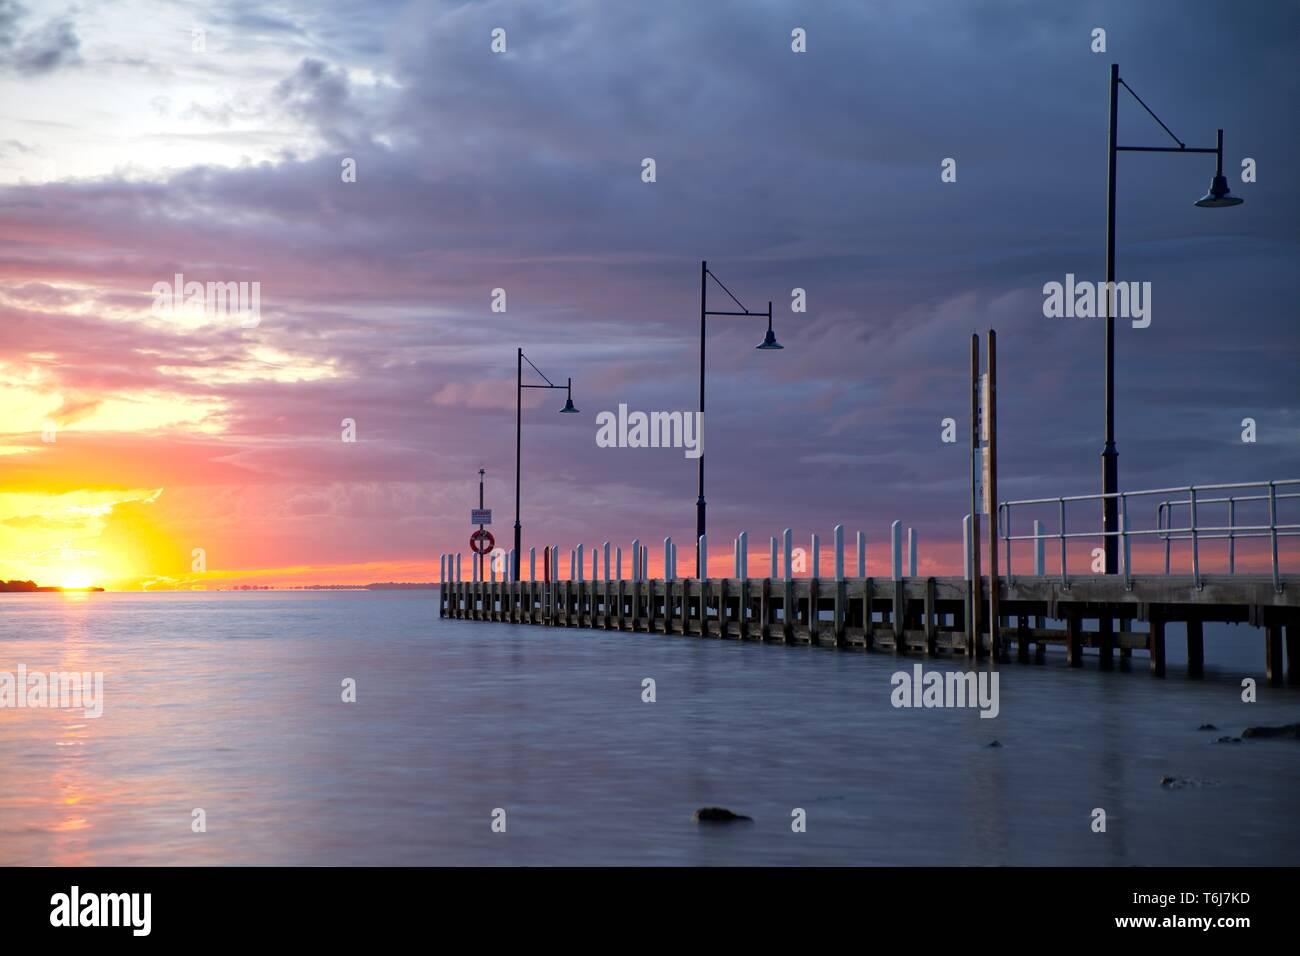 Gippsland Lakes Stock Photos & Gippsland Lakes Stock Images - Alamy